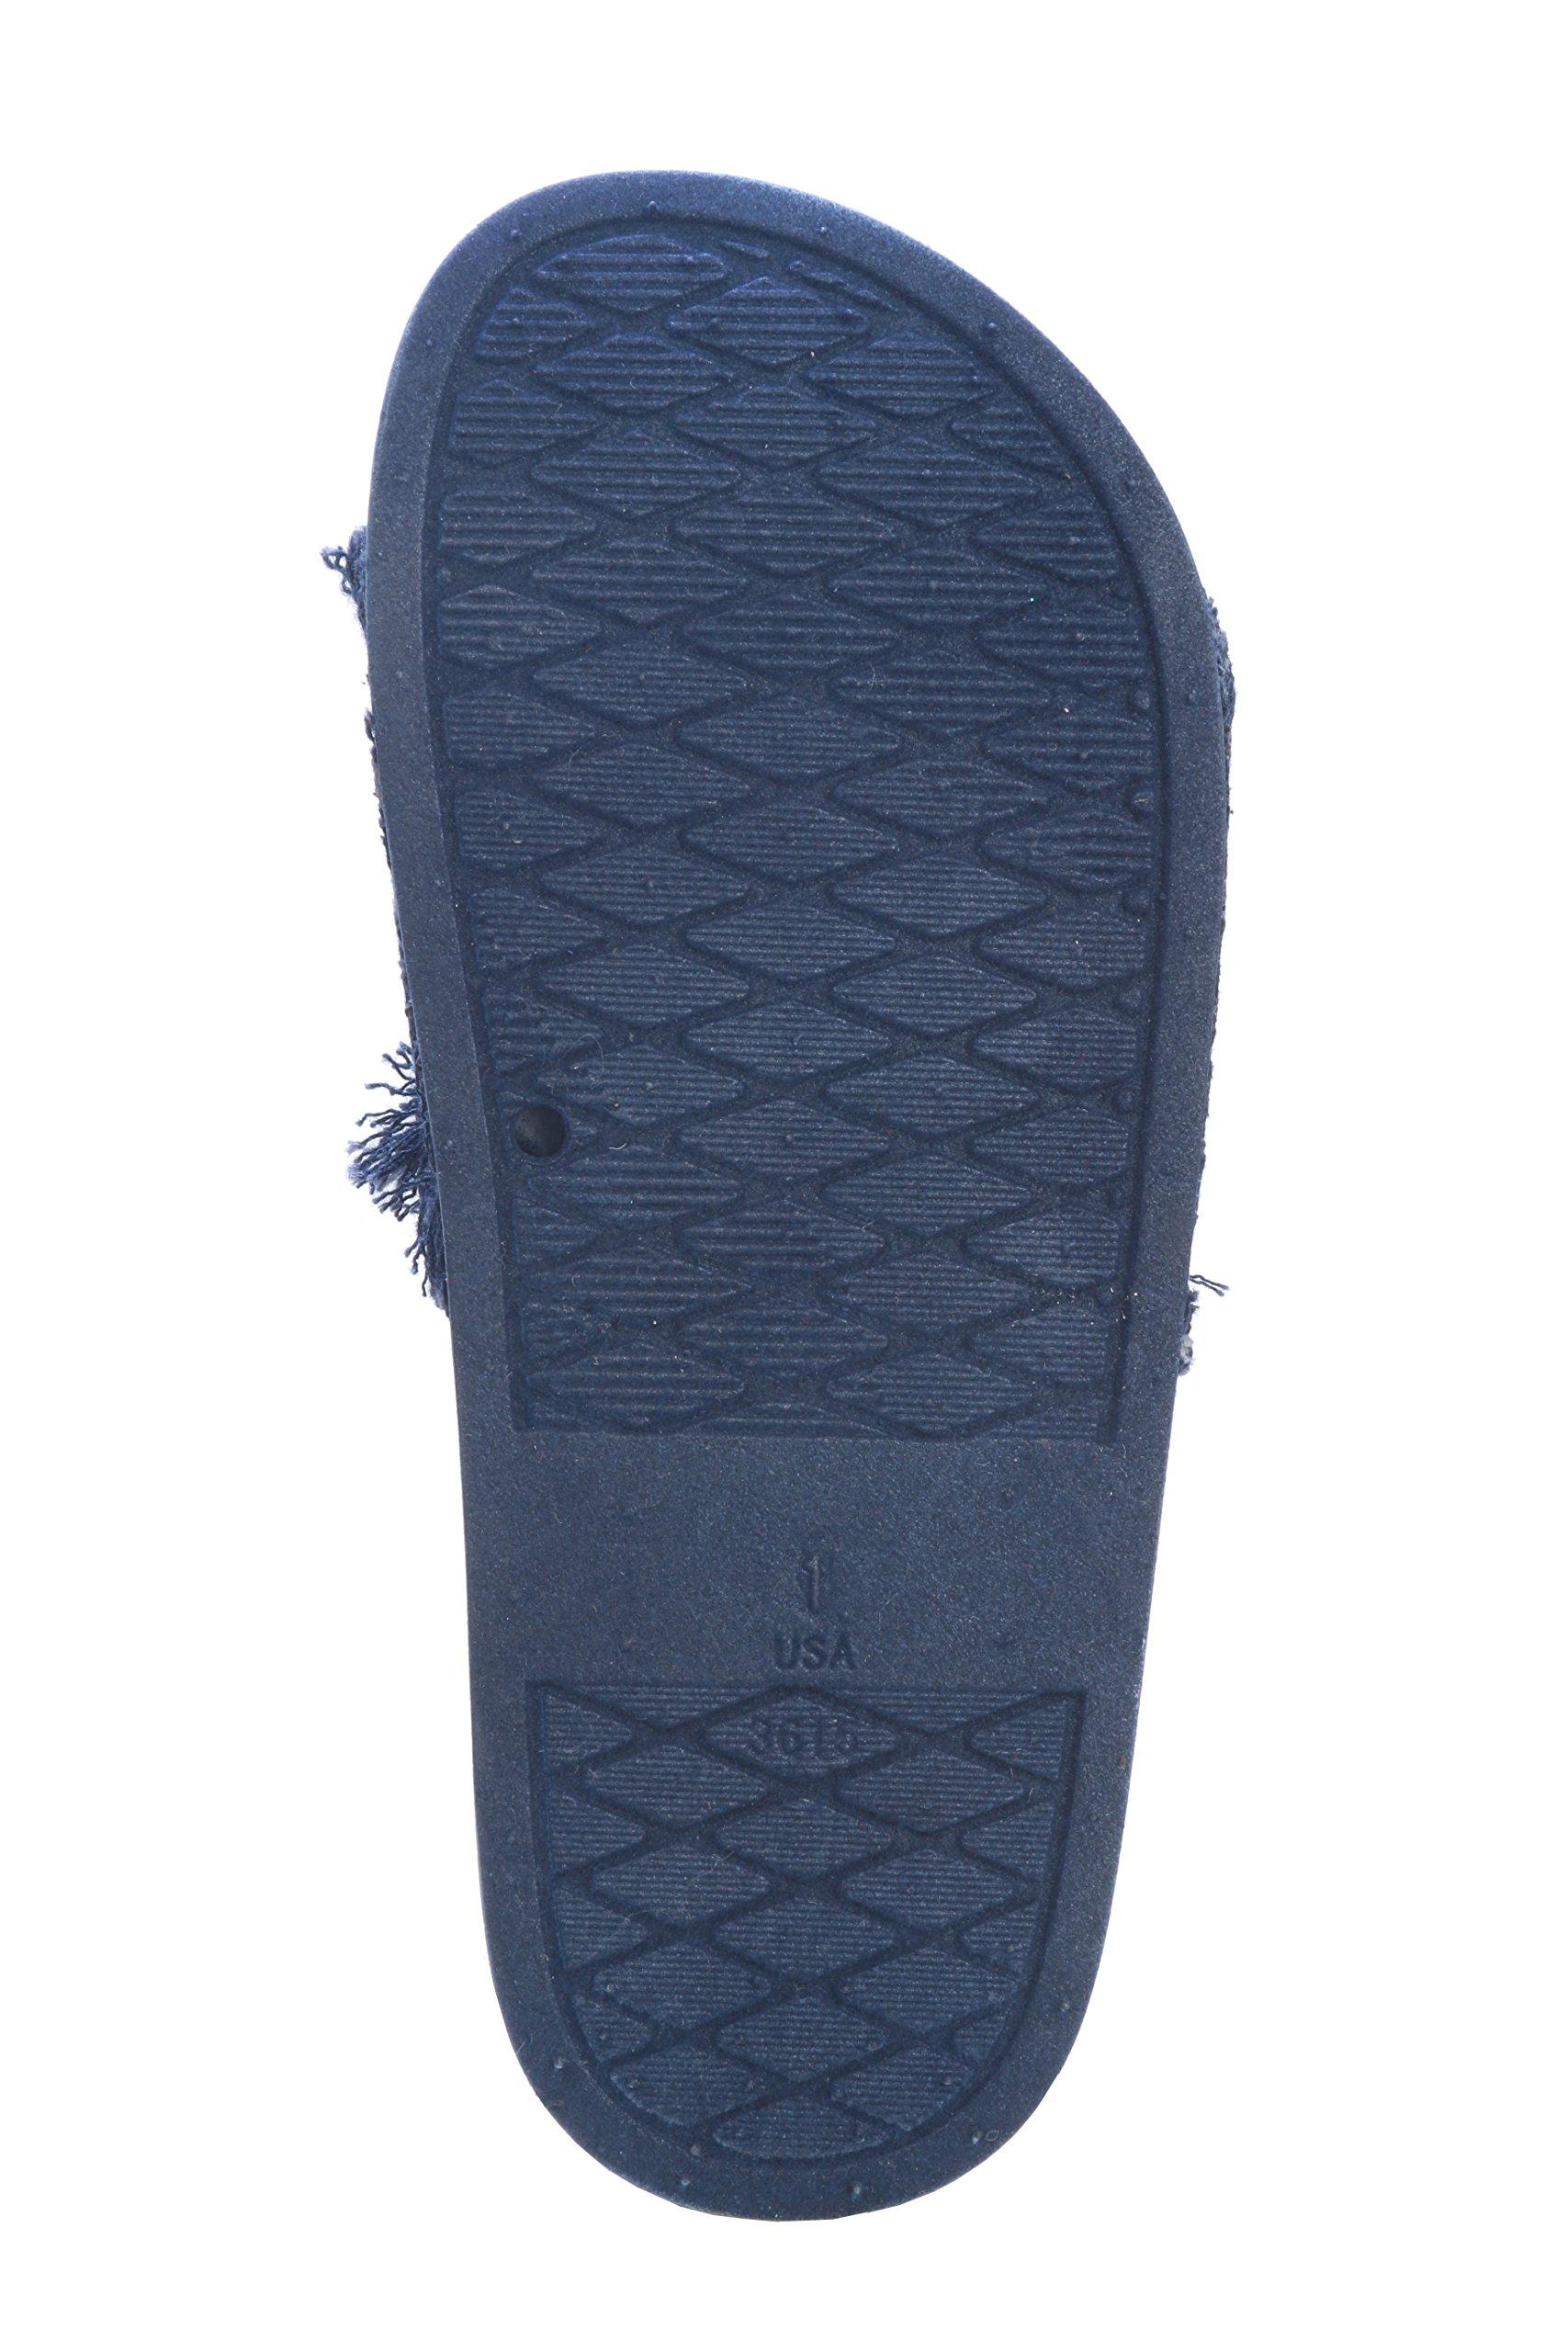 Pupeez Girl's Slide Sandals Kids Open Toe Denim Summer Slippers Ultra Comfort by Pupeez (Image #4)